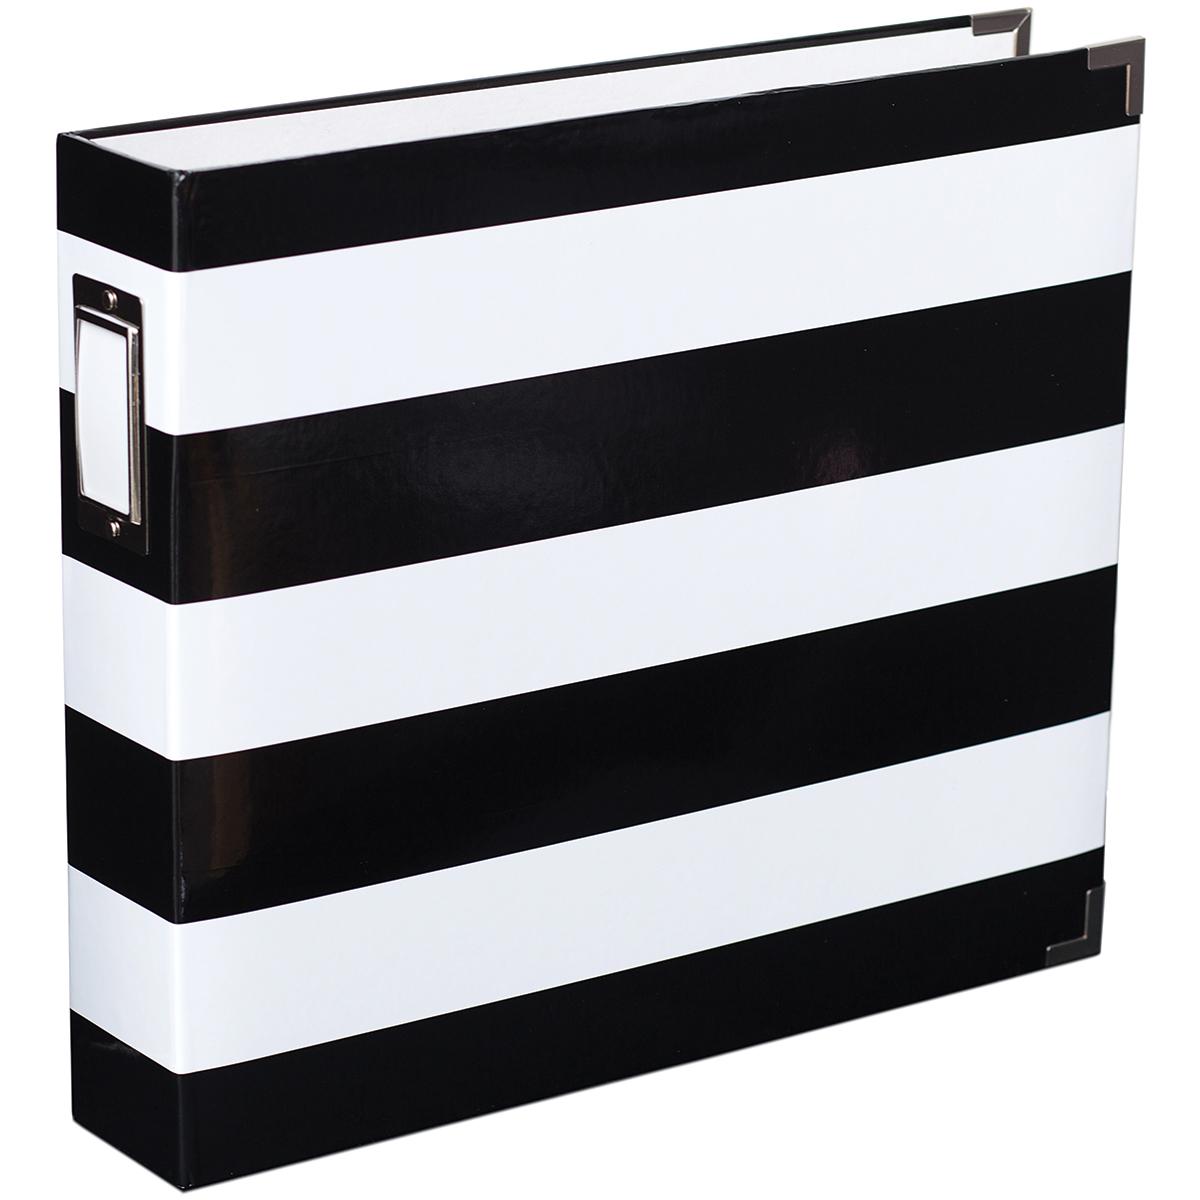 Project Life D-Ring Album 12X12-Black & White Stripe By Heidi Swapp